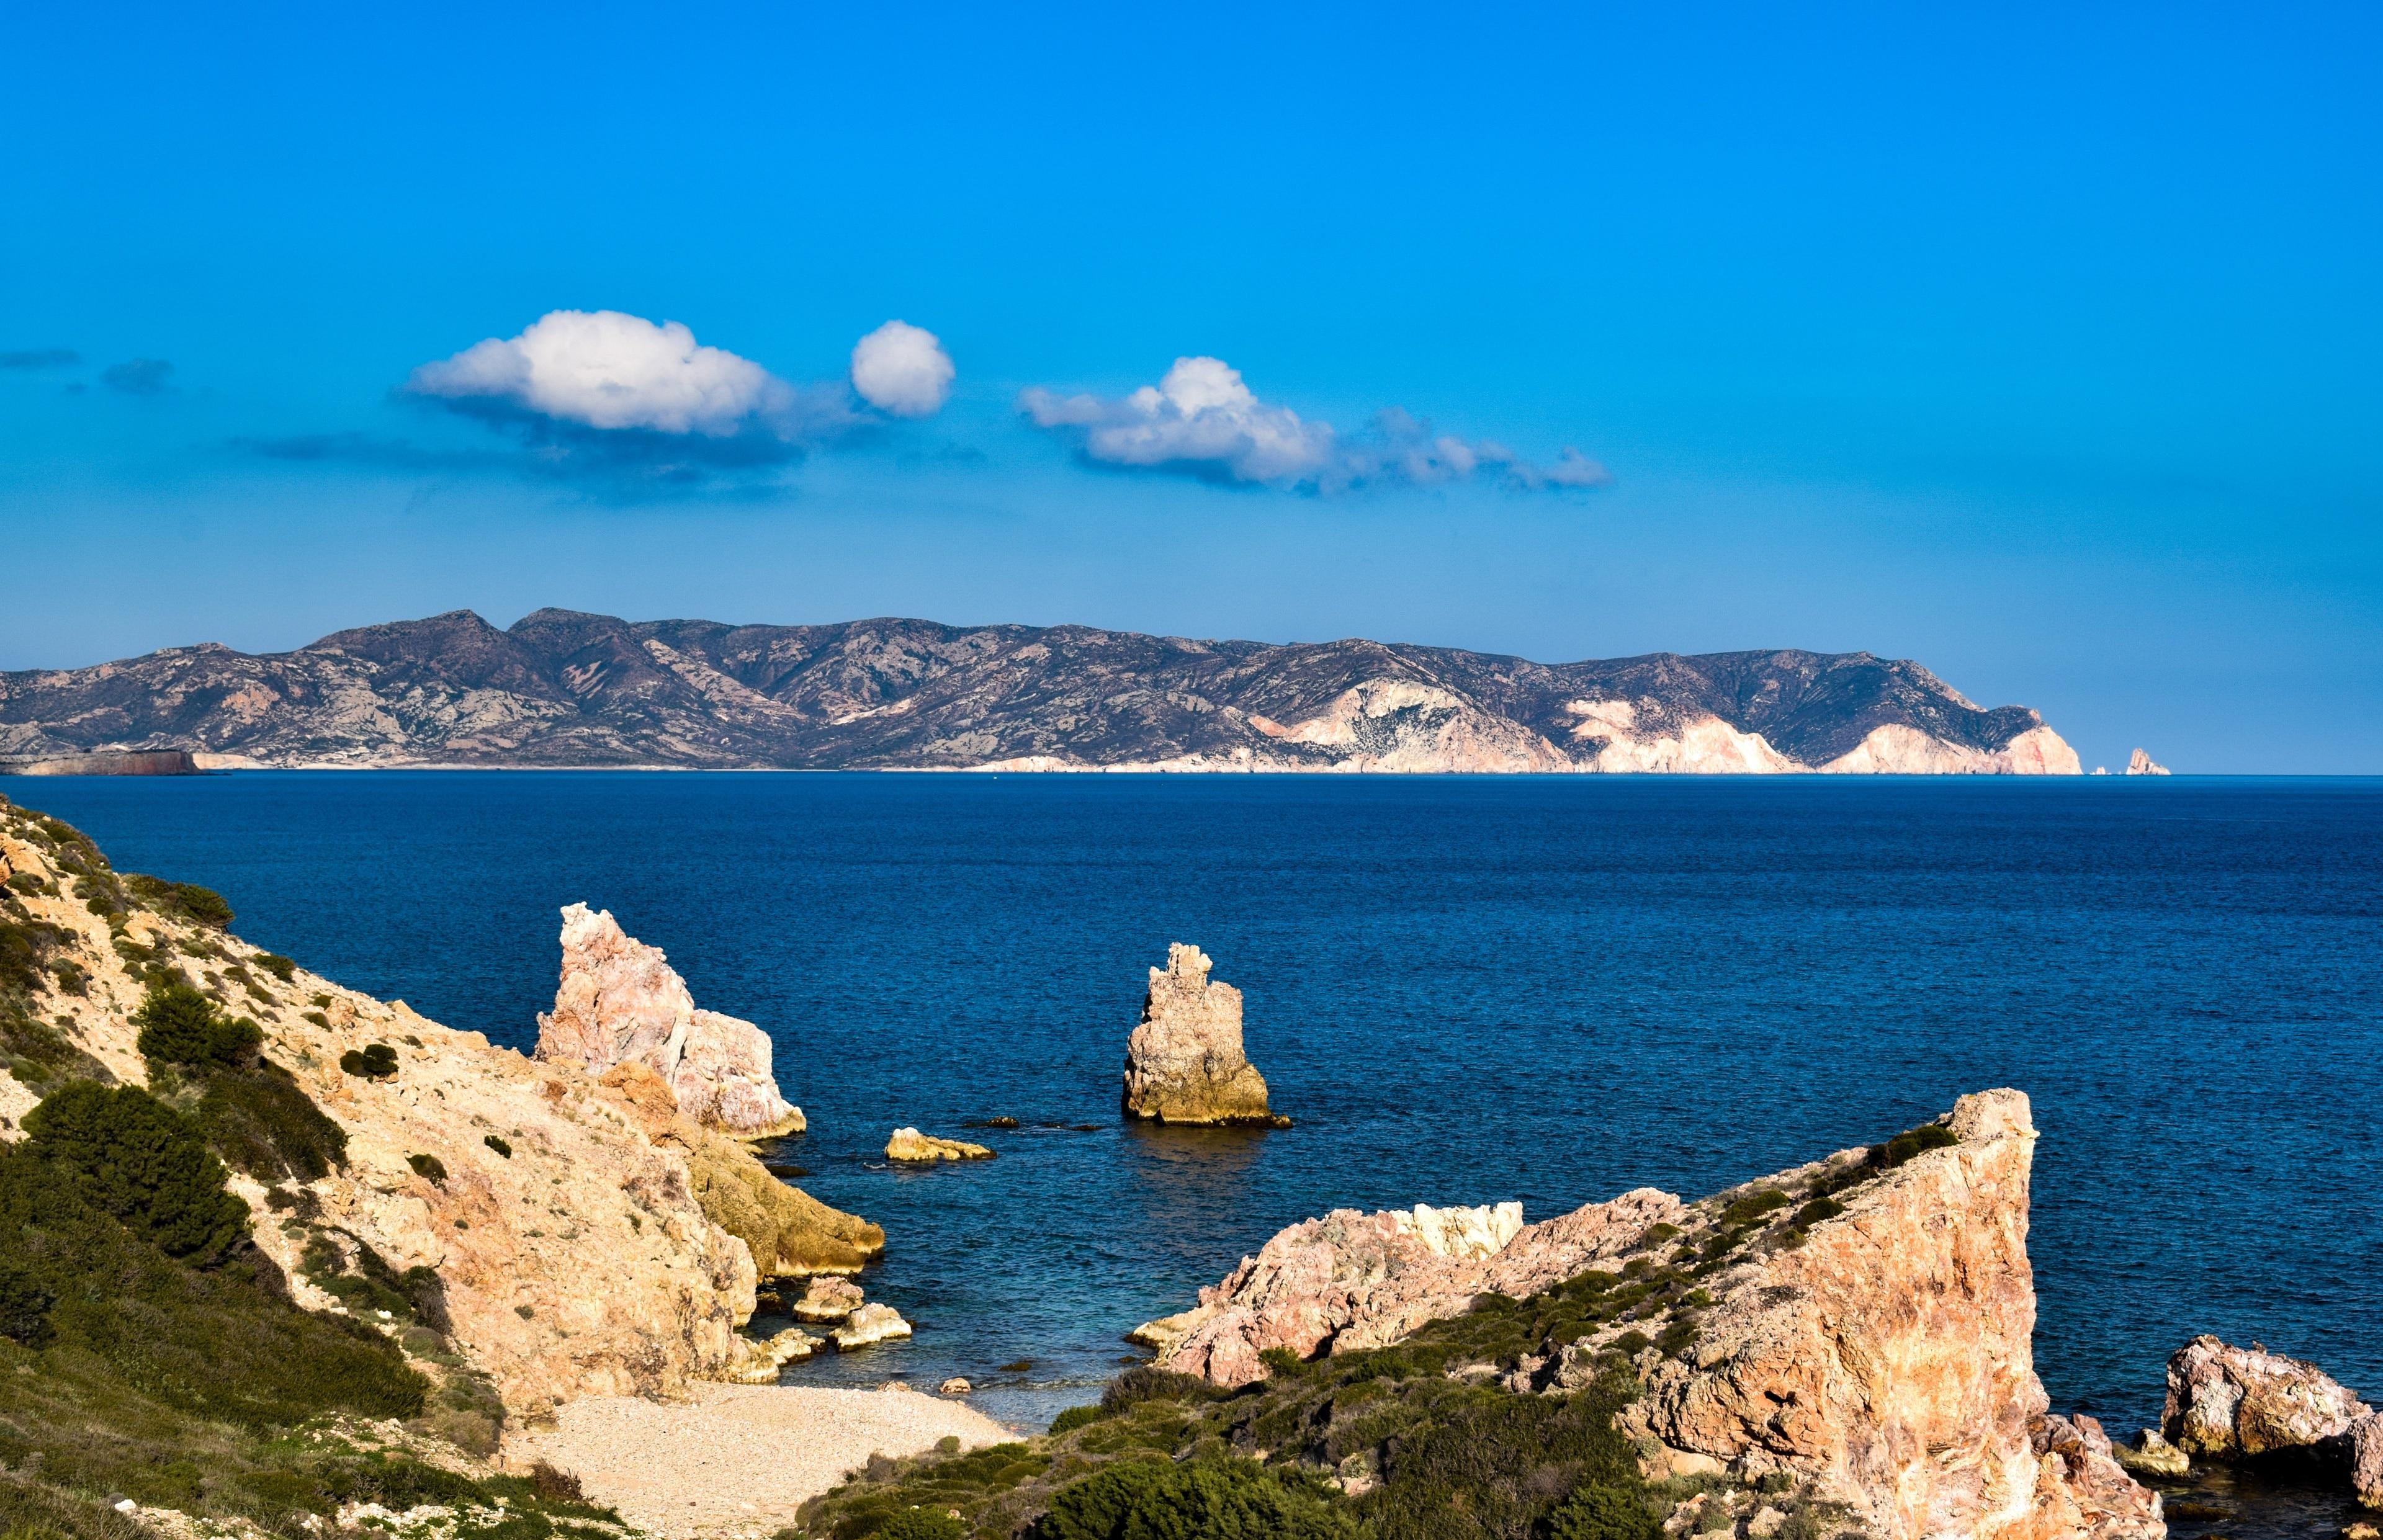 Milos, South Aegean, Greece